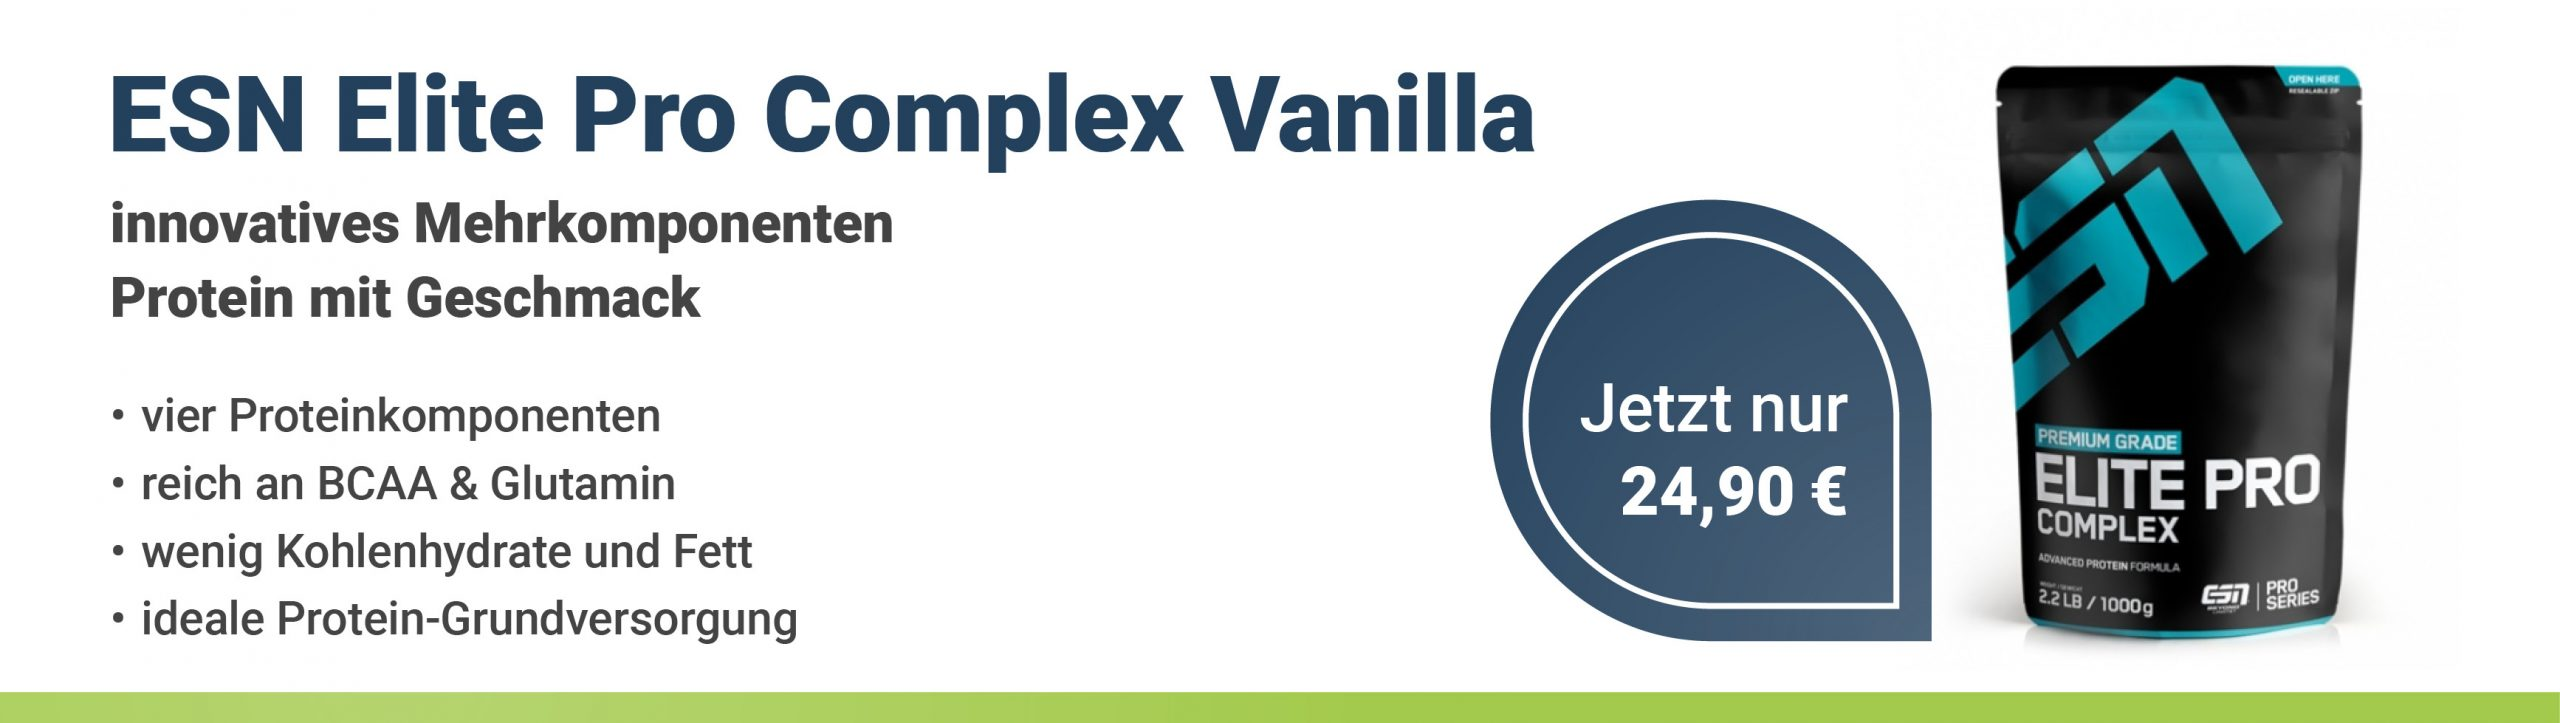 https://www.health-rise.de/wp-content/uploads/2021/08/ESN-Elite-Pro-Complex-Vanilla_mobil.jpg